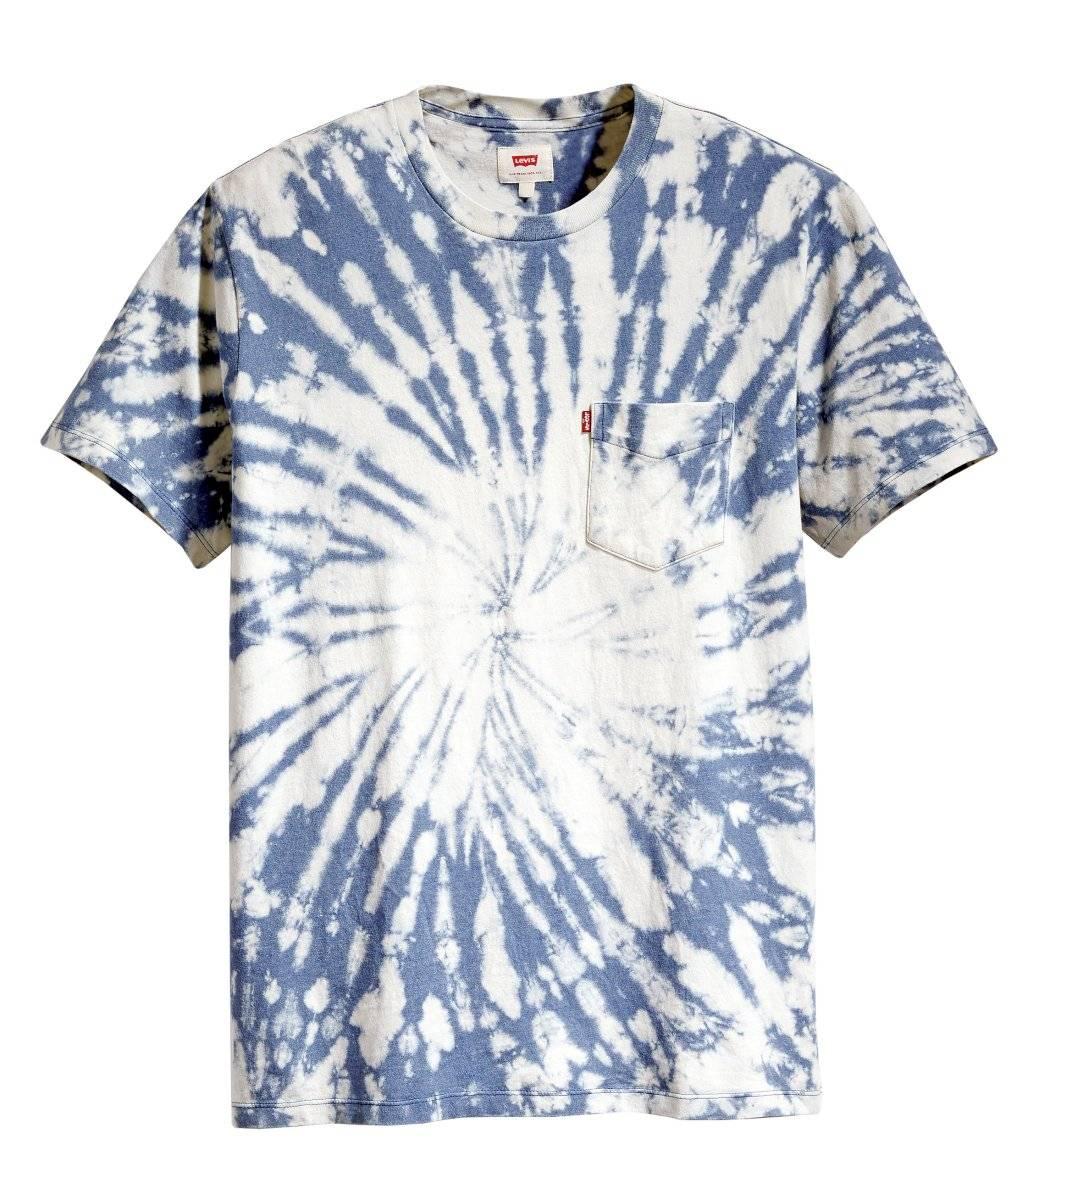 Camiseta Levi's Preço sugerido: R$ 109,90 www.levi.com.br